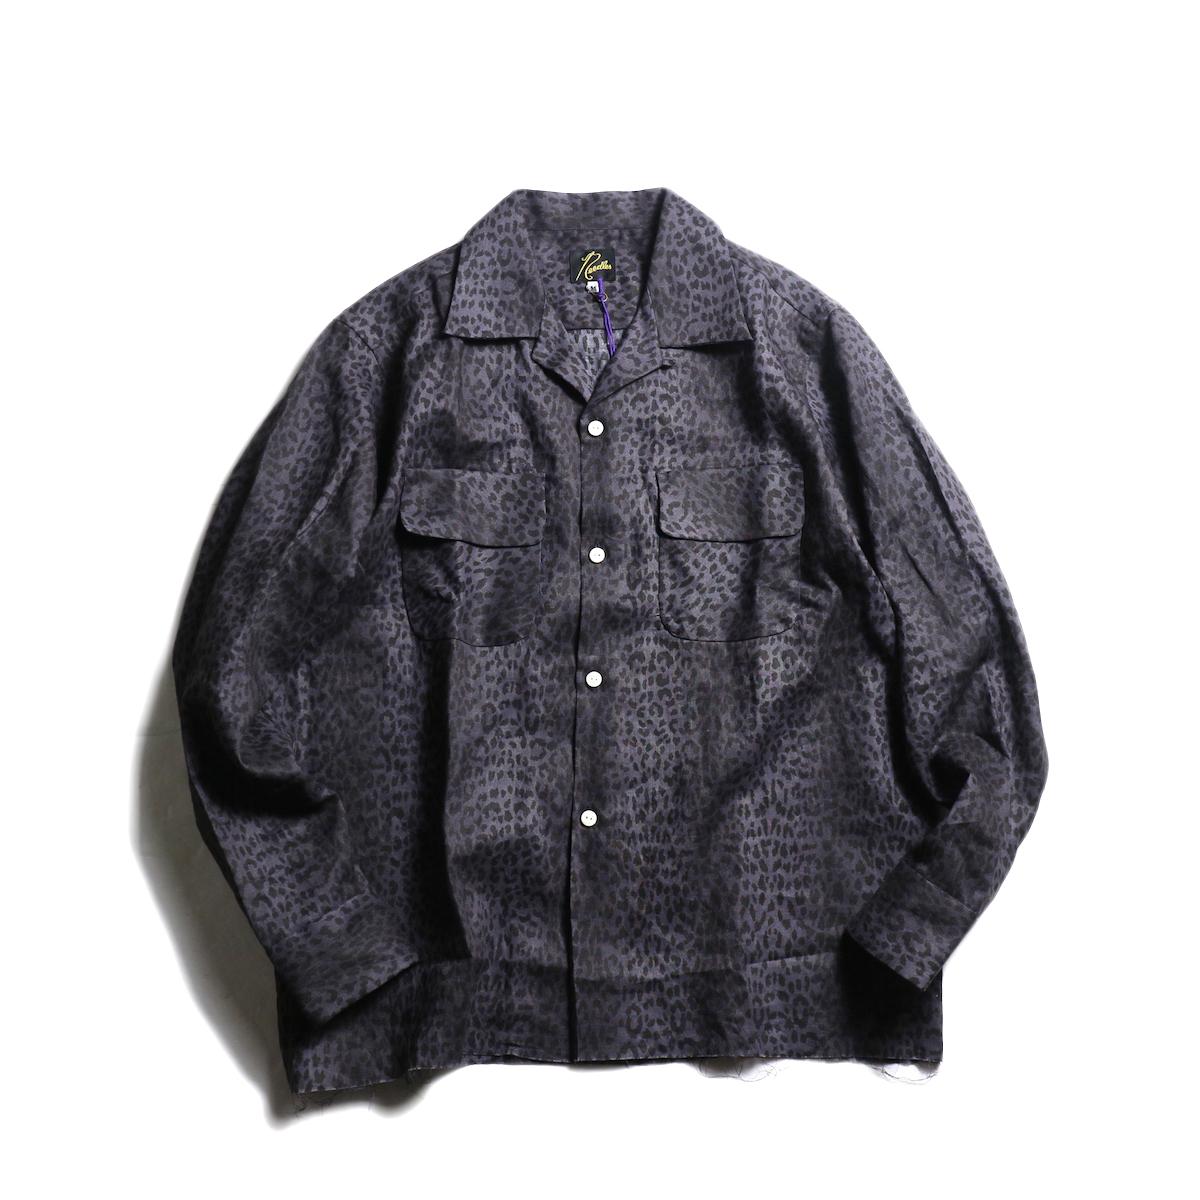 NEEDLES / Cut-Off Bottom Classic Shirt -Linen Cloth / Leopard Print (Gray)